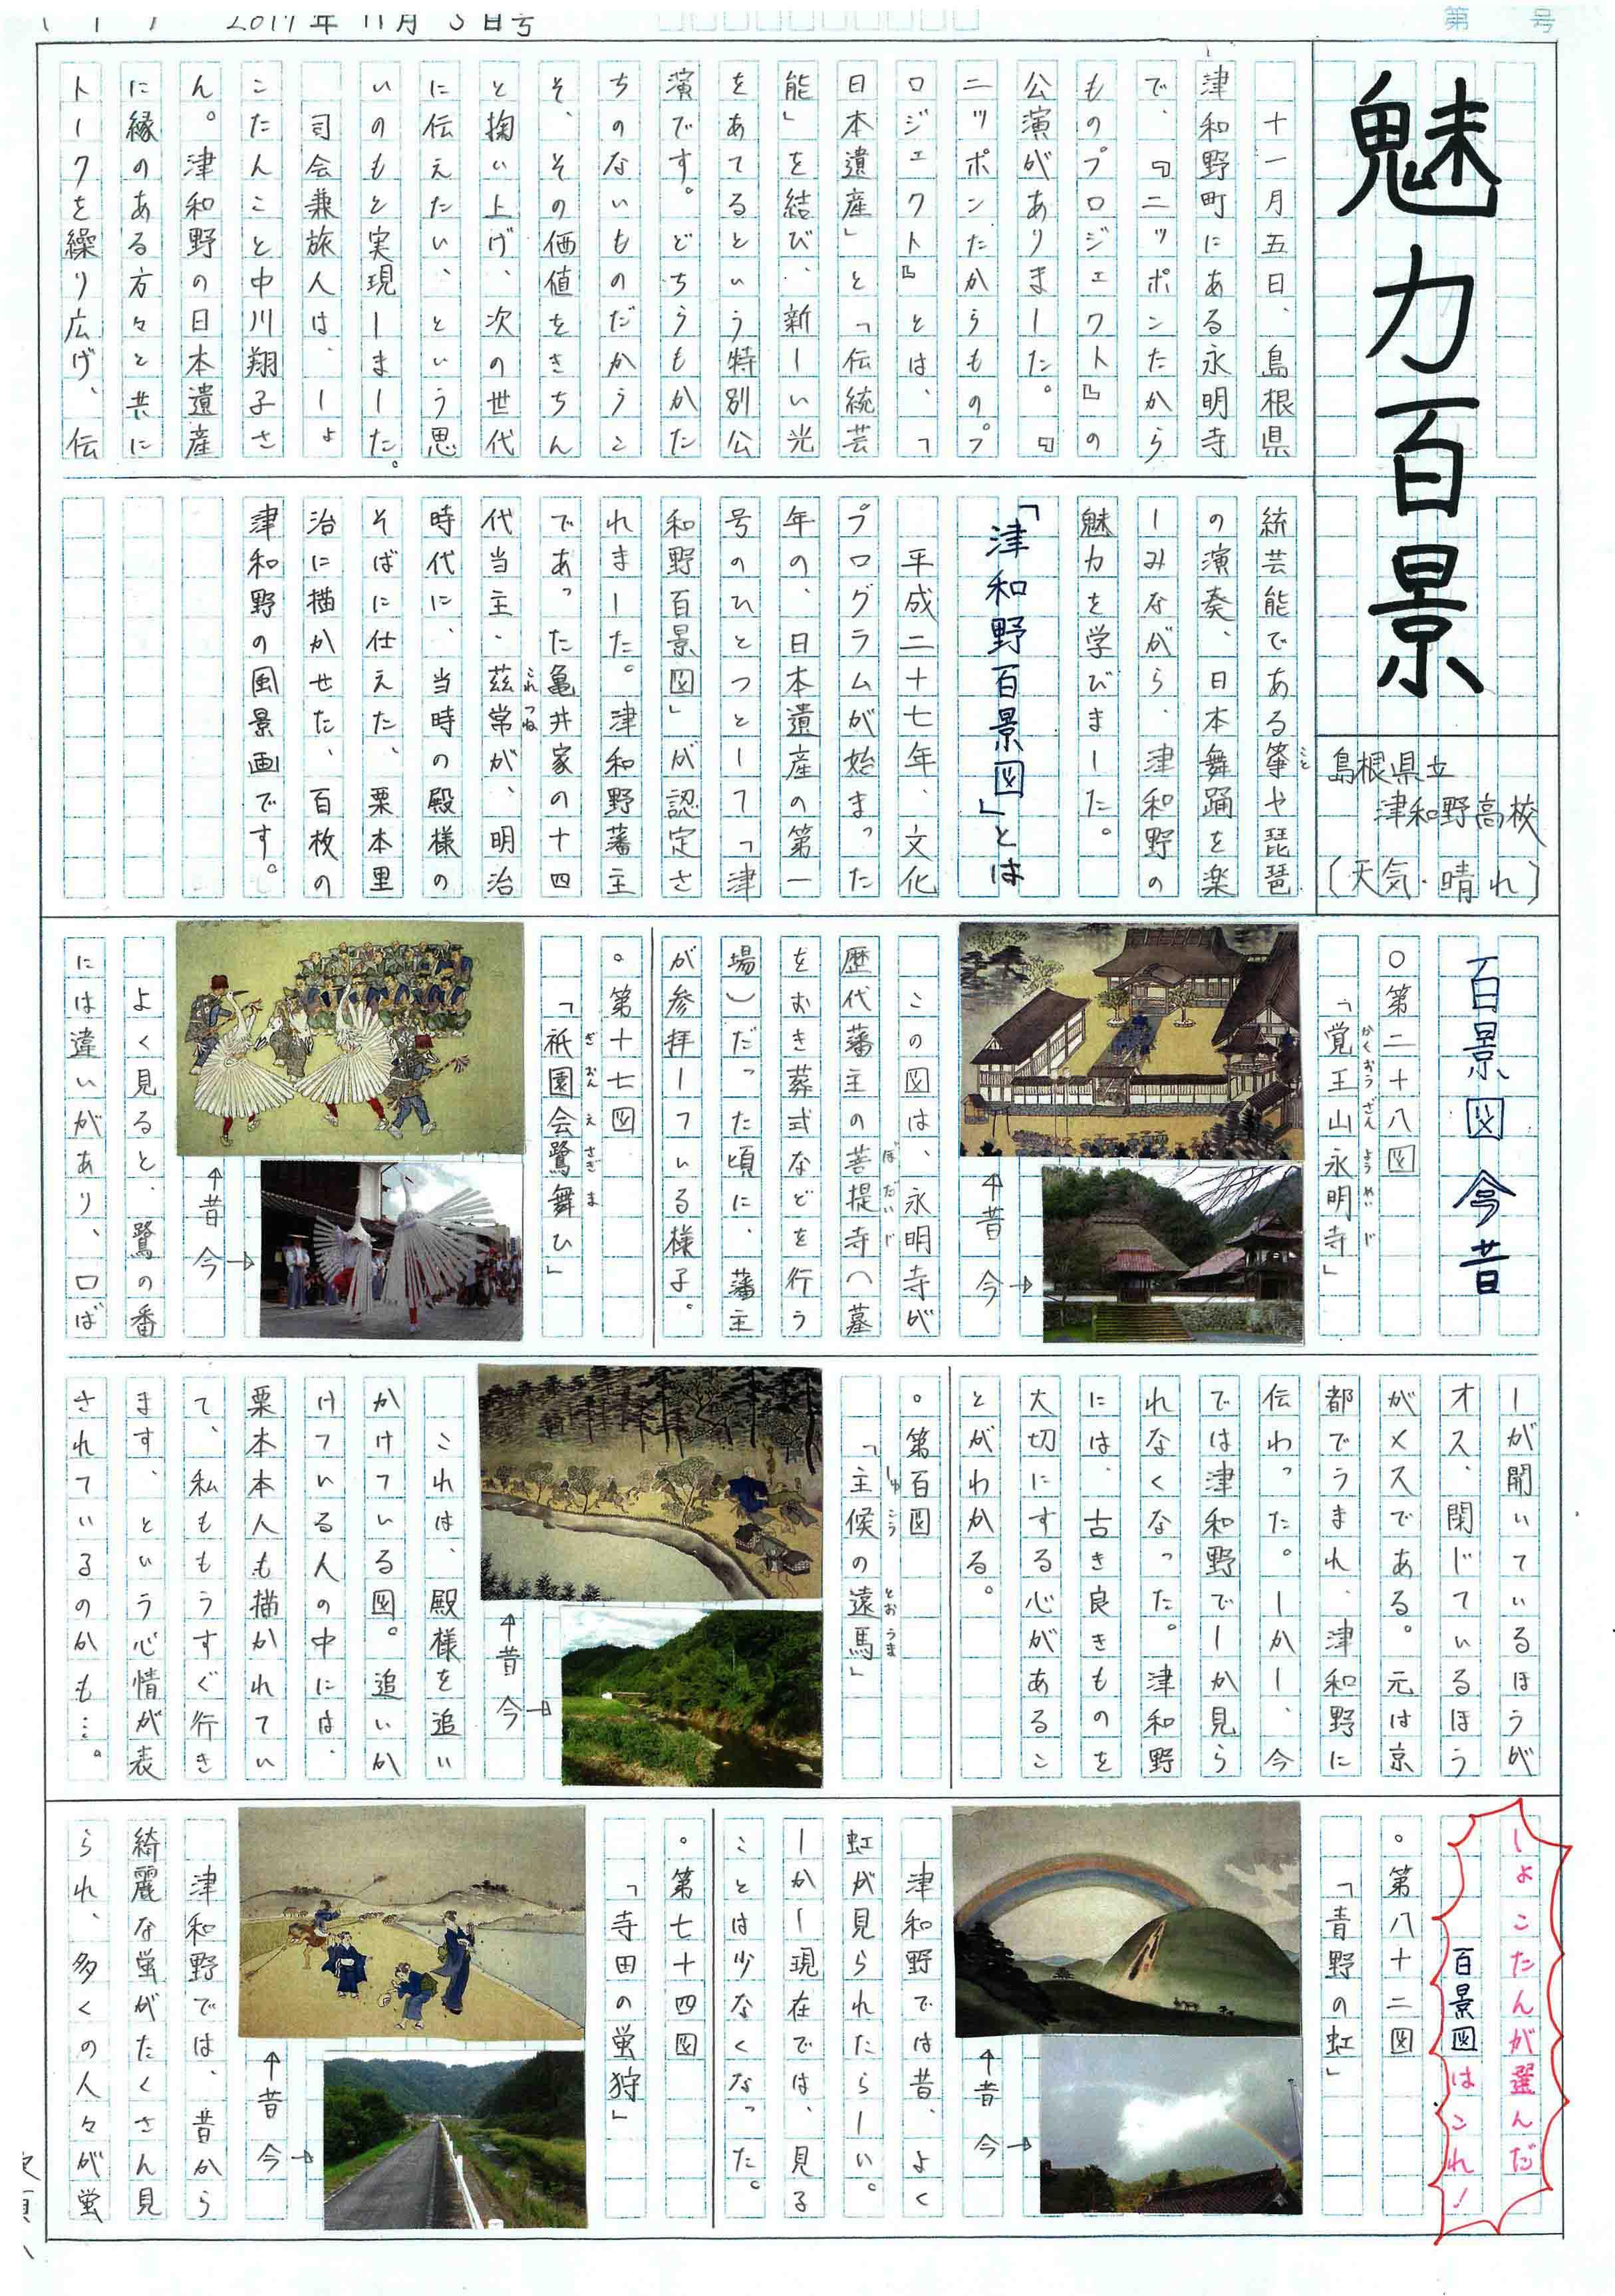 http://bunp.47news.jp/event/images/mpage1.jpg